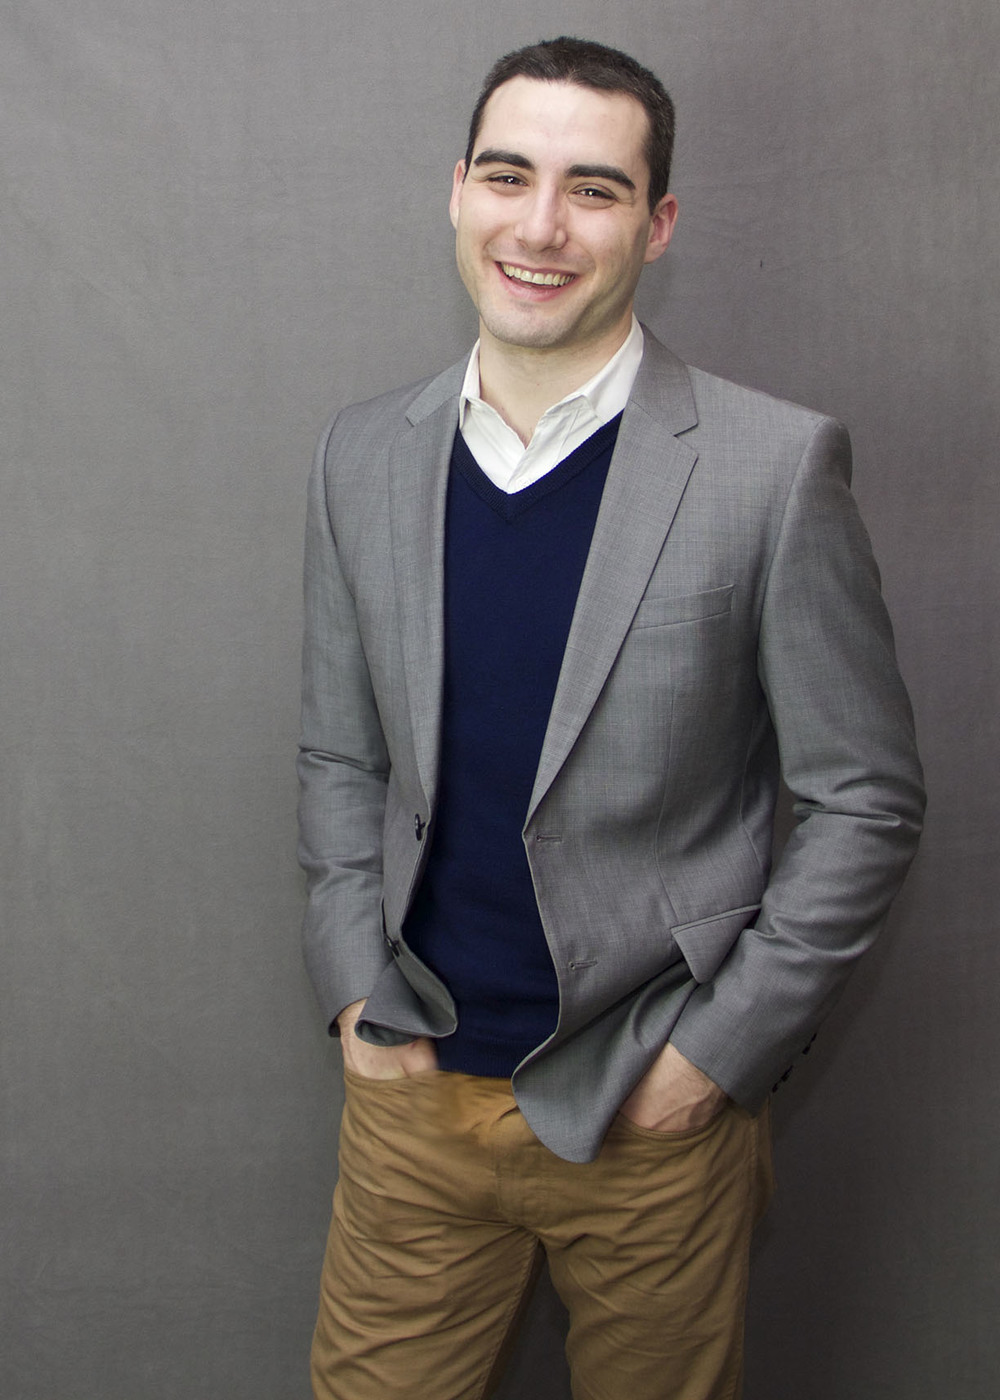 Professional-Business Shot_Studio Headshots_LinkedIn.jpg